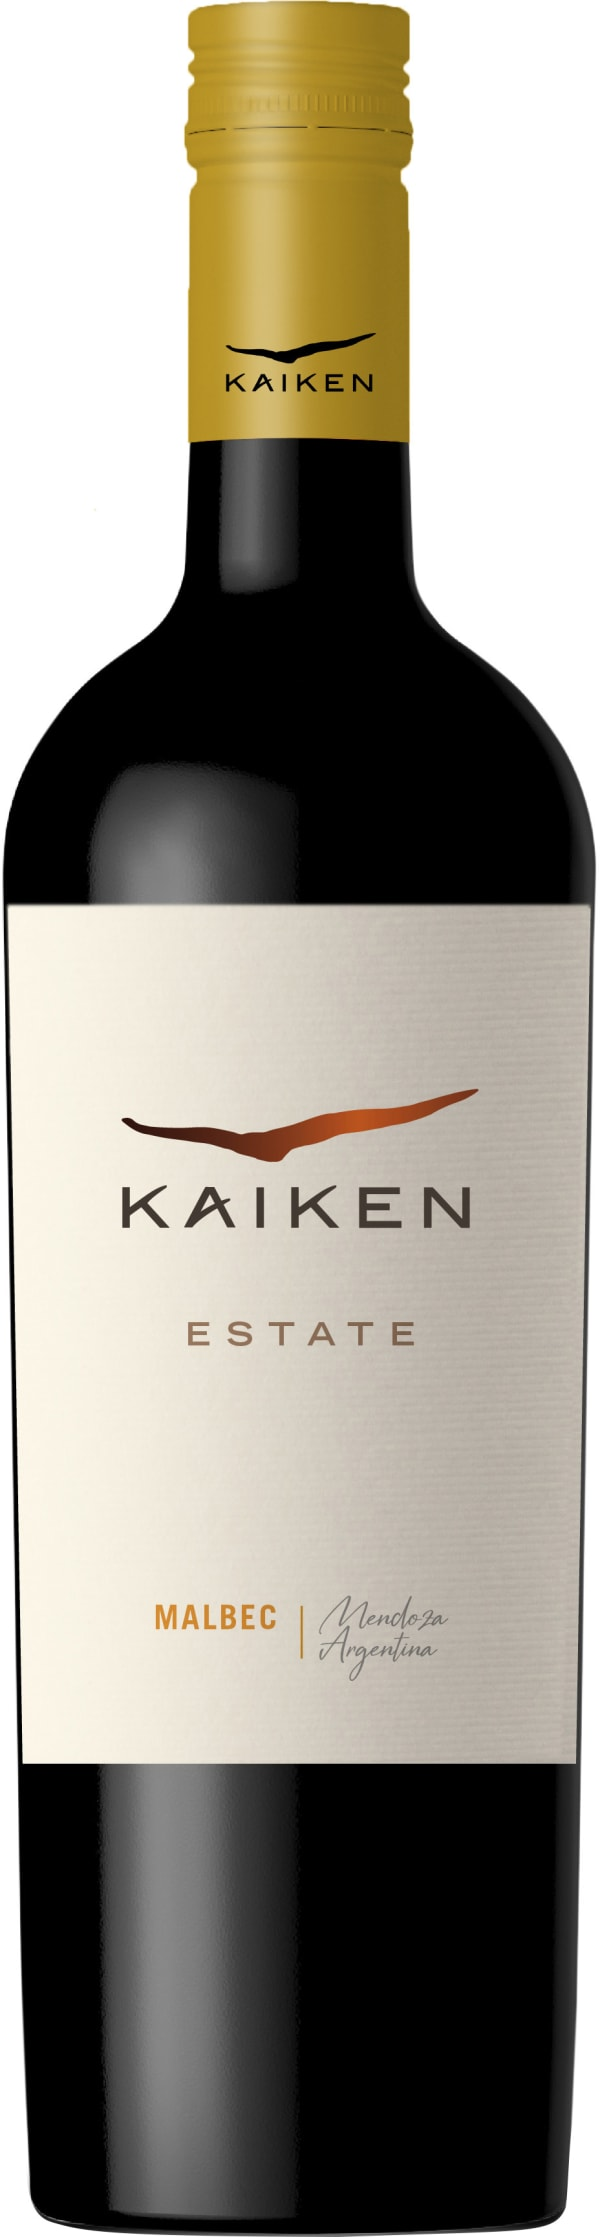 Kaiken Reserve Malbec 2016